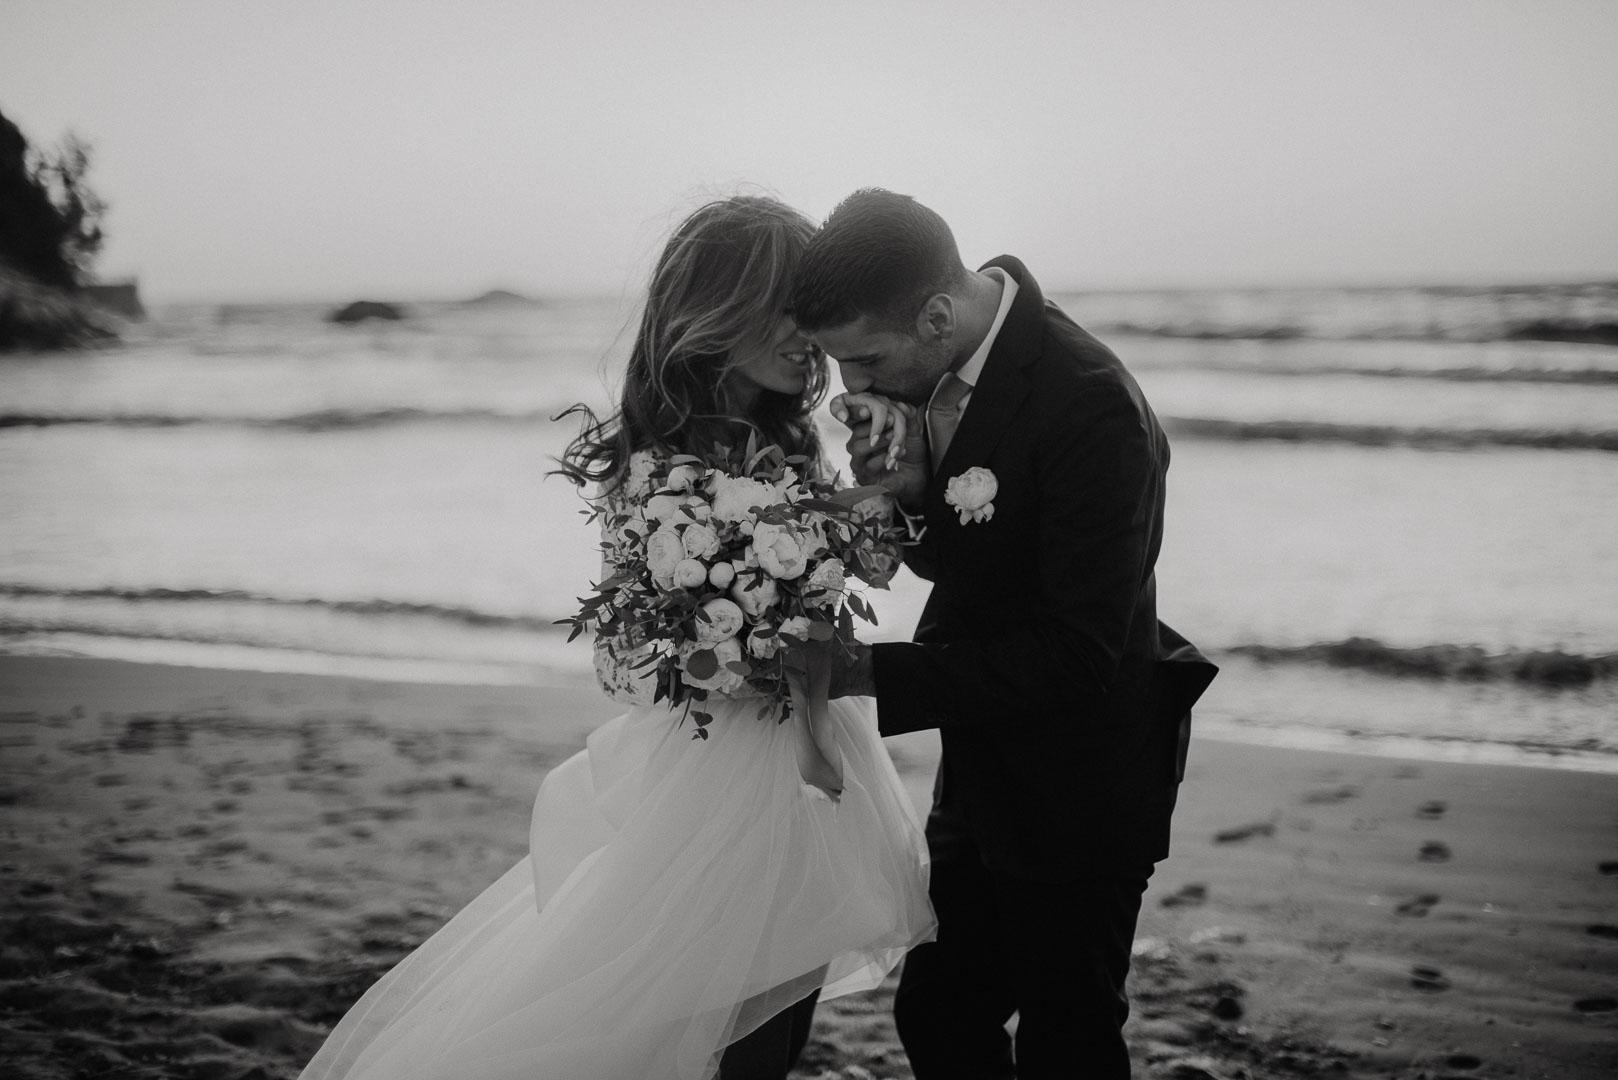 wedding-photographer-destination-fineart-bespoke-reportage-napoli-nabilah-vivianeizzo-spazio46-132